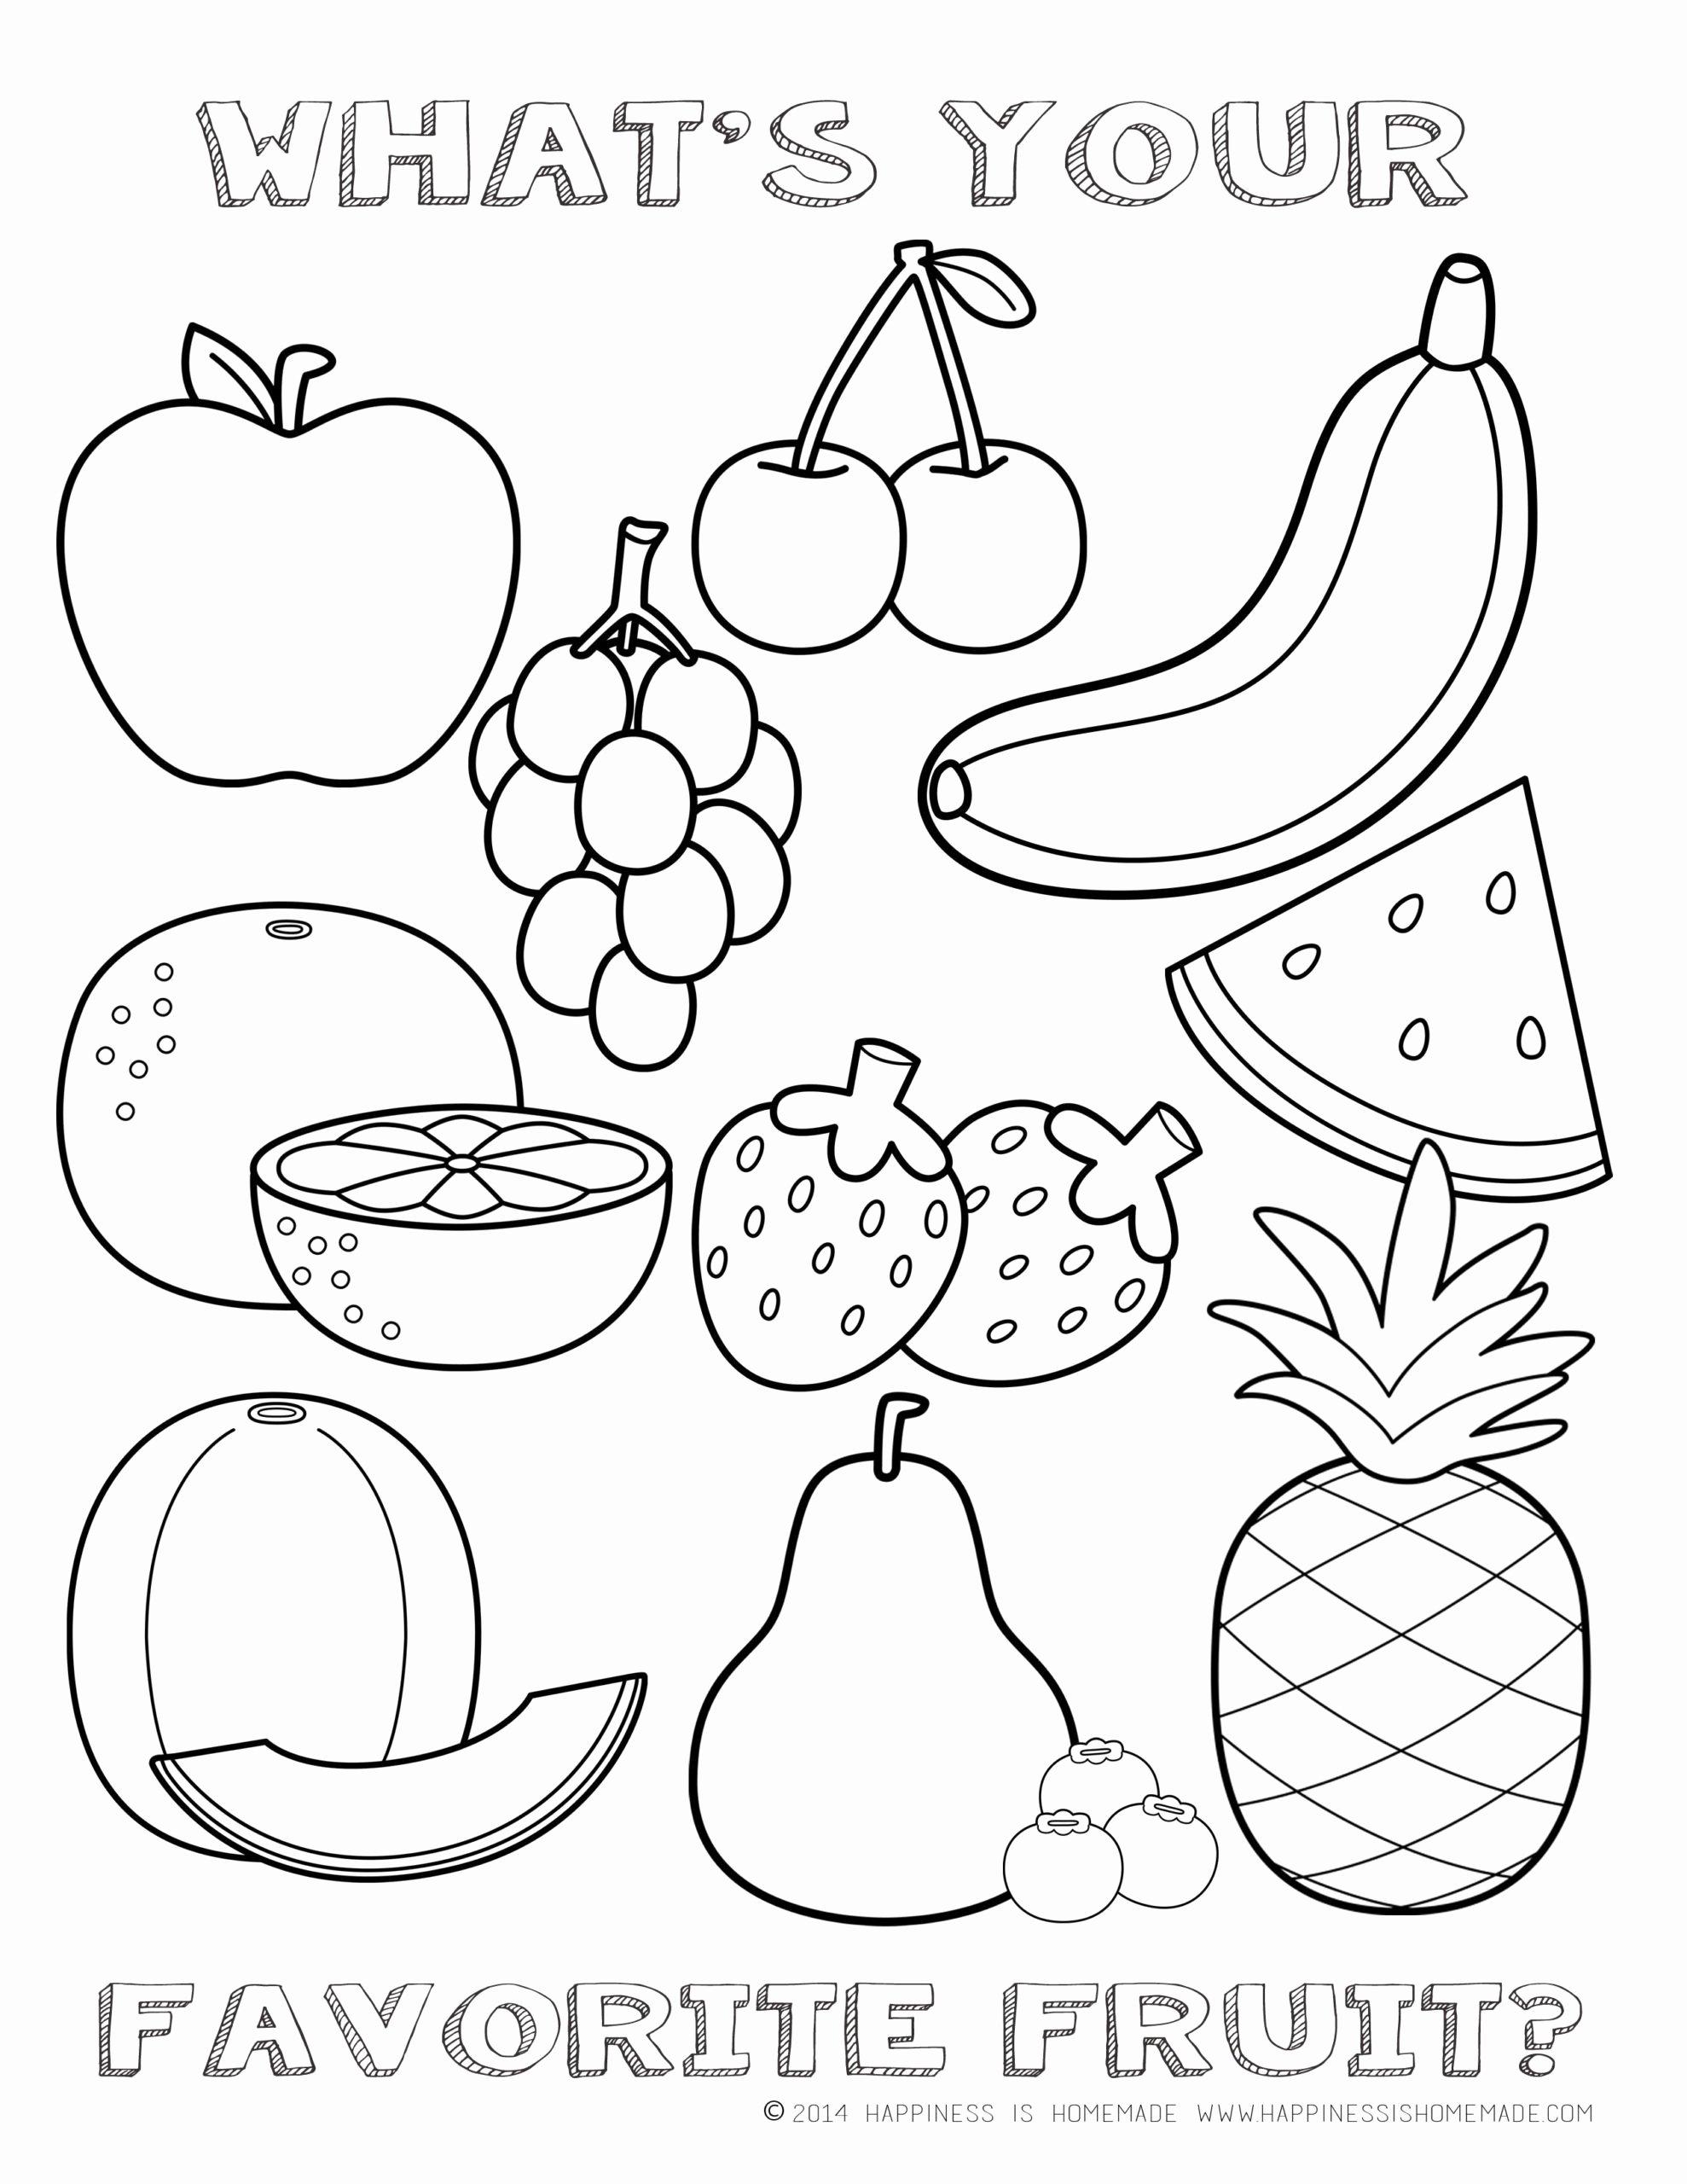 Vegetables Worksheets for Preschoolers top Worksheets Ve Ables Worksheet for Preschool Family